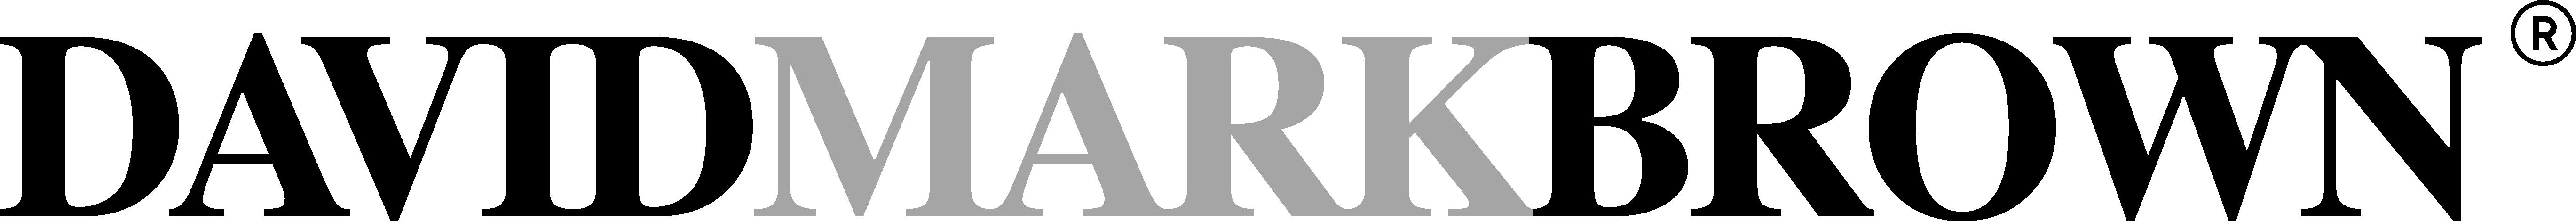 David Mark Brown logo